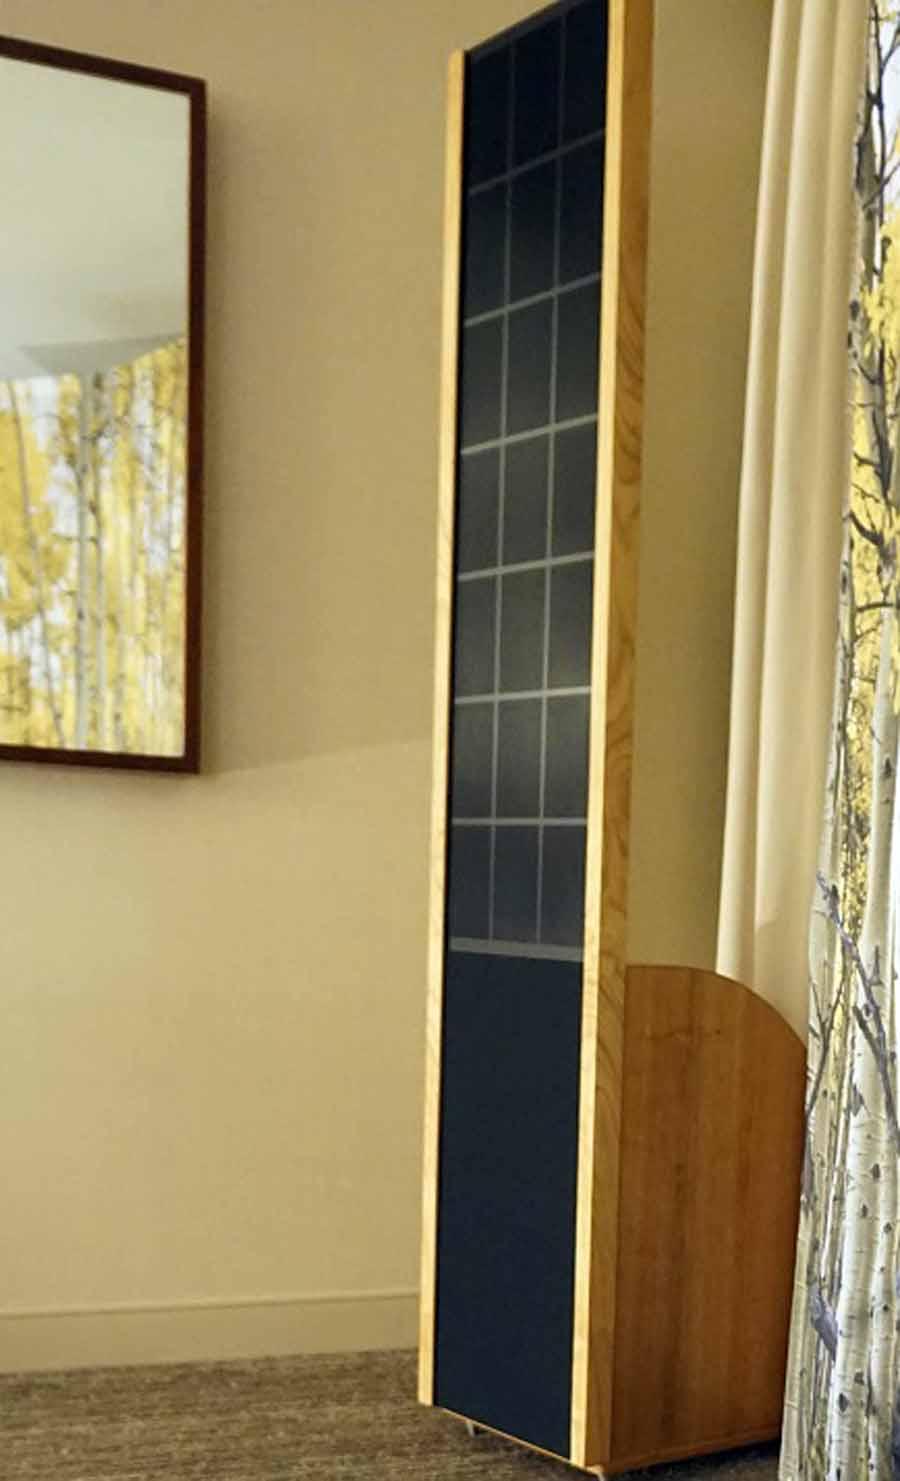 Sanders Sound Model 10e Electrostatic Speaker Preview | Audioholics